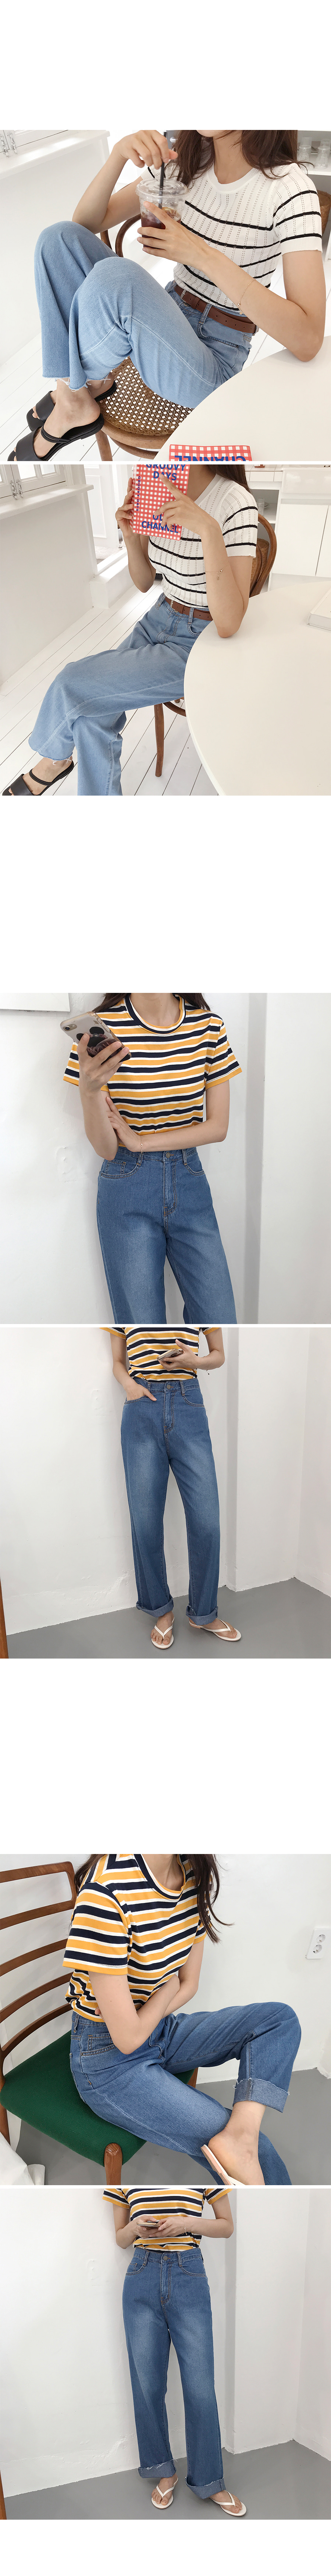 Street long denim jeans